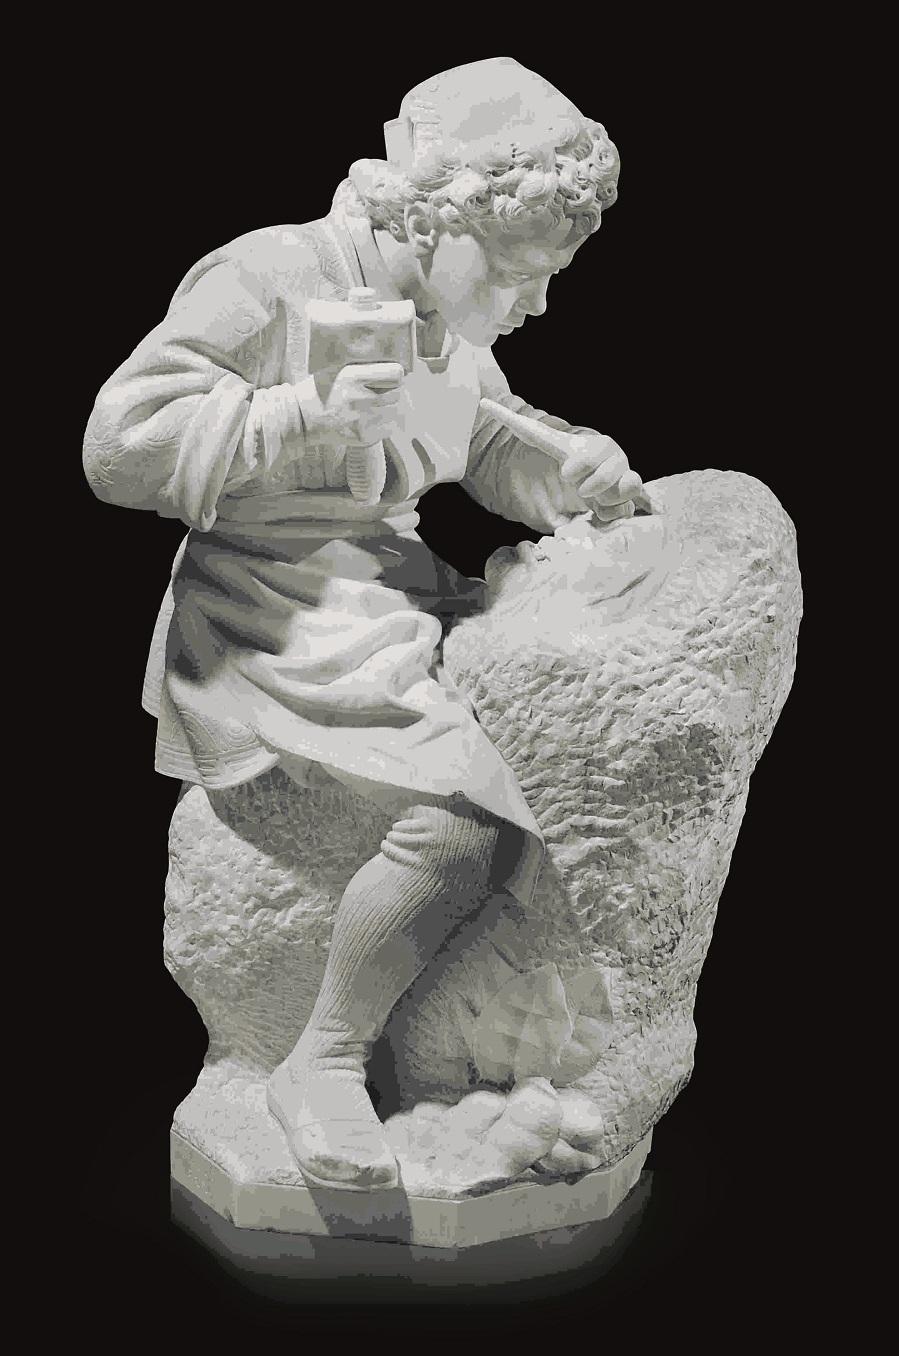 Young Michelangelo Carving a Faun's Head. (Молодой Микеланджело, резьба головы Фауна)